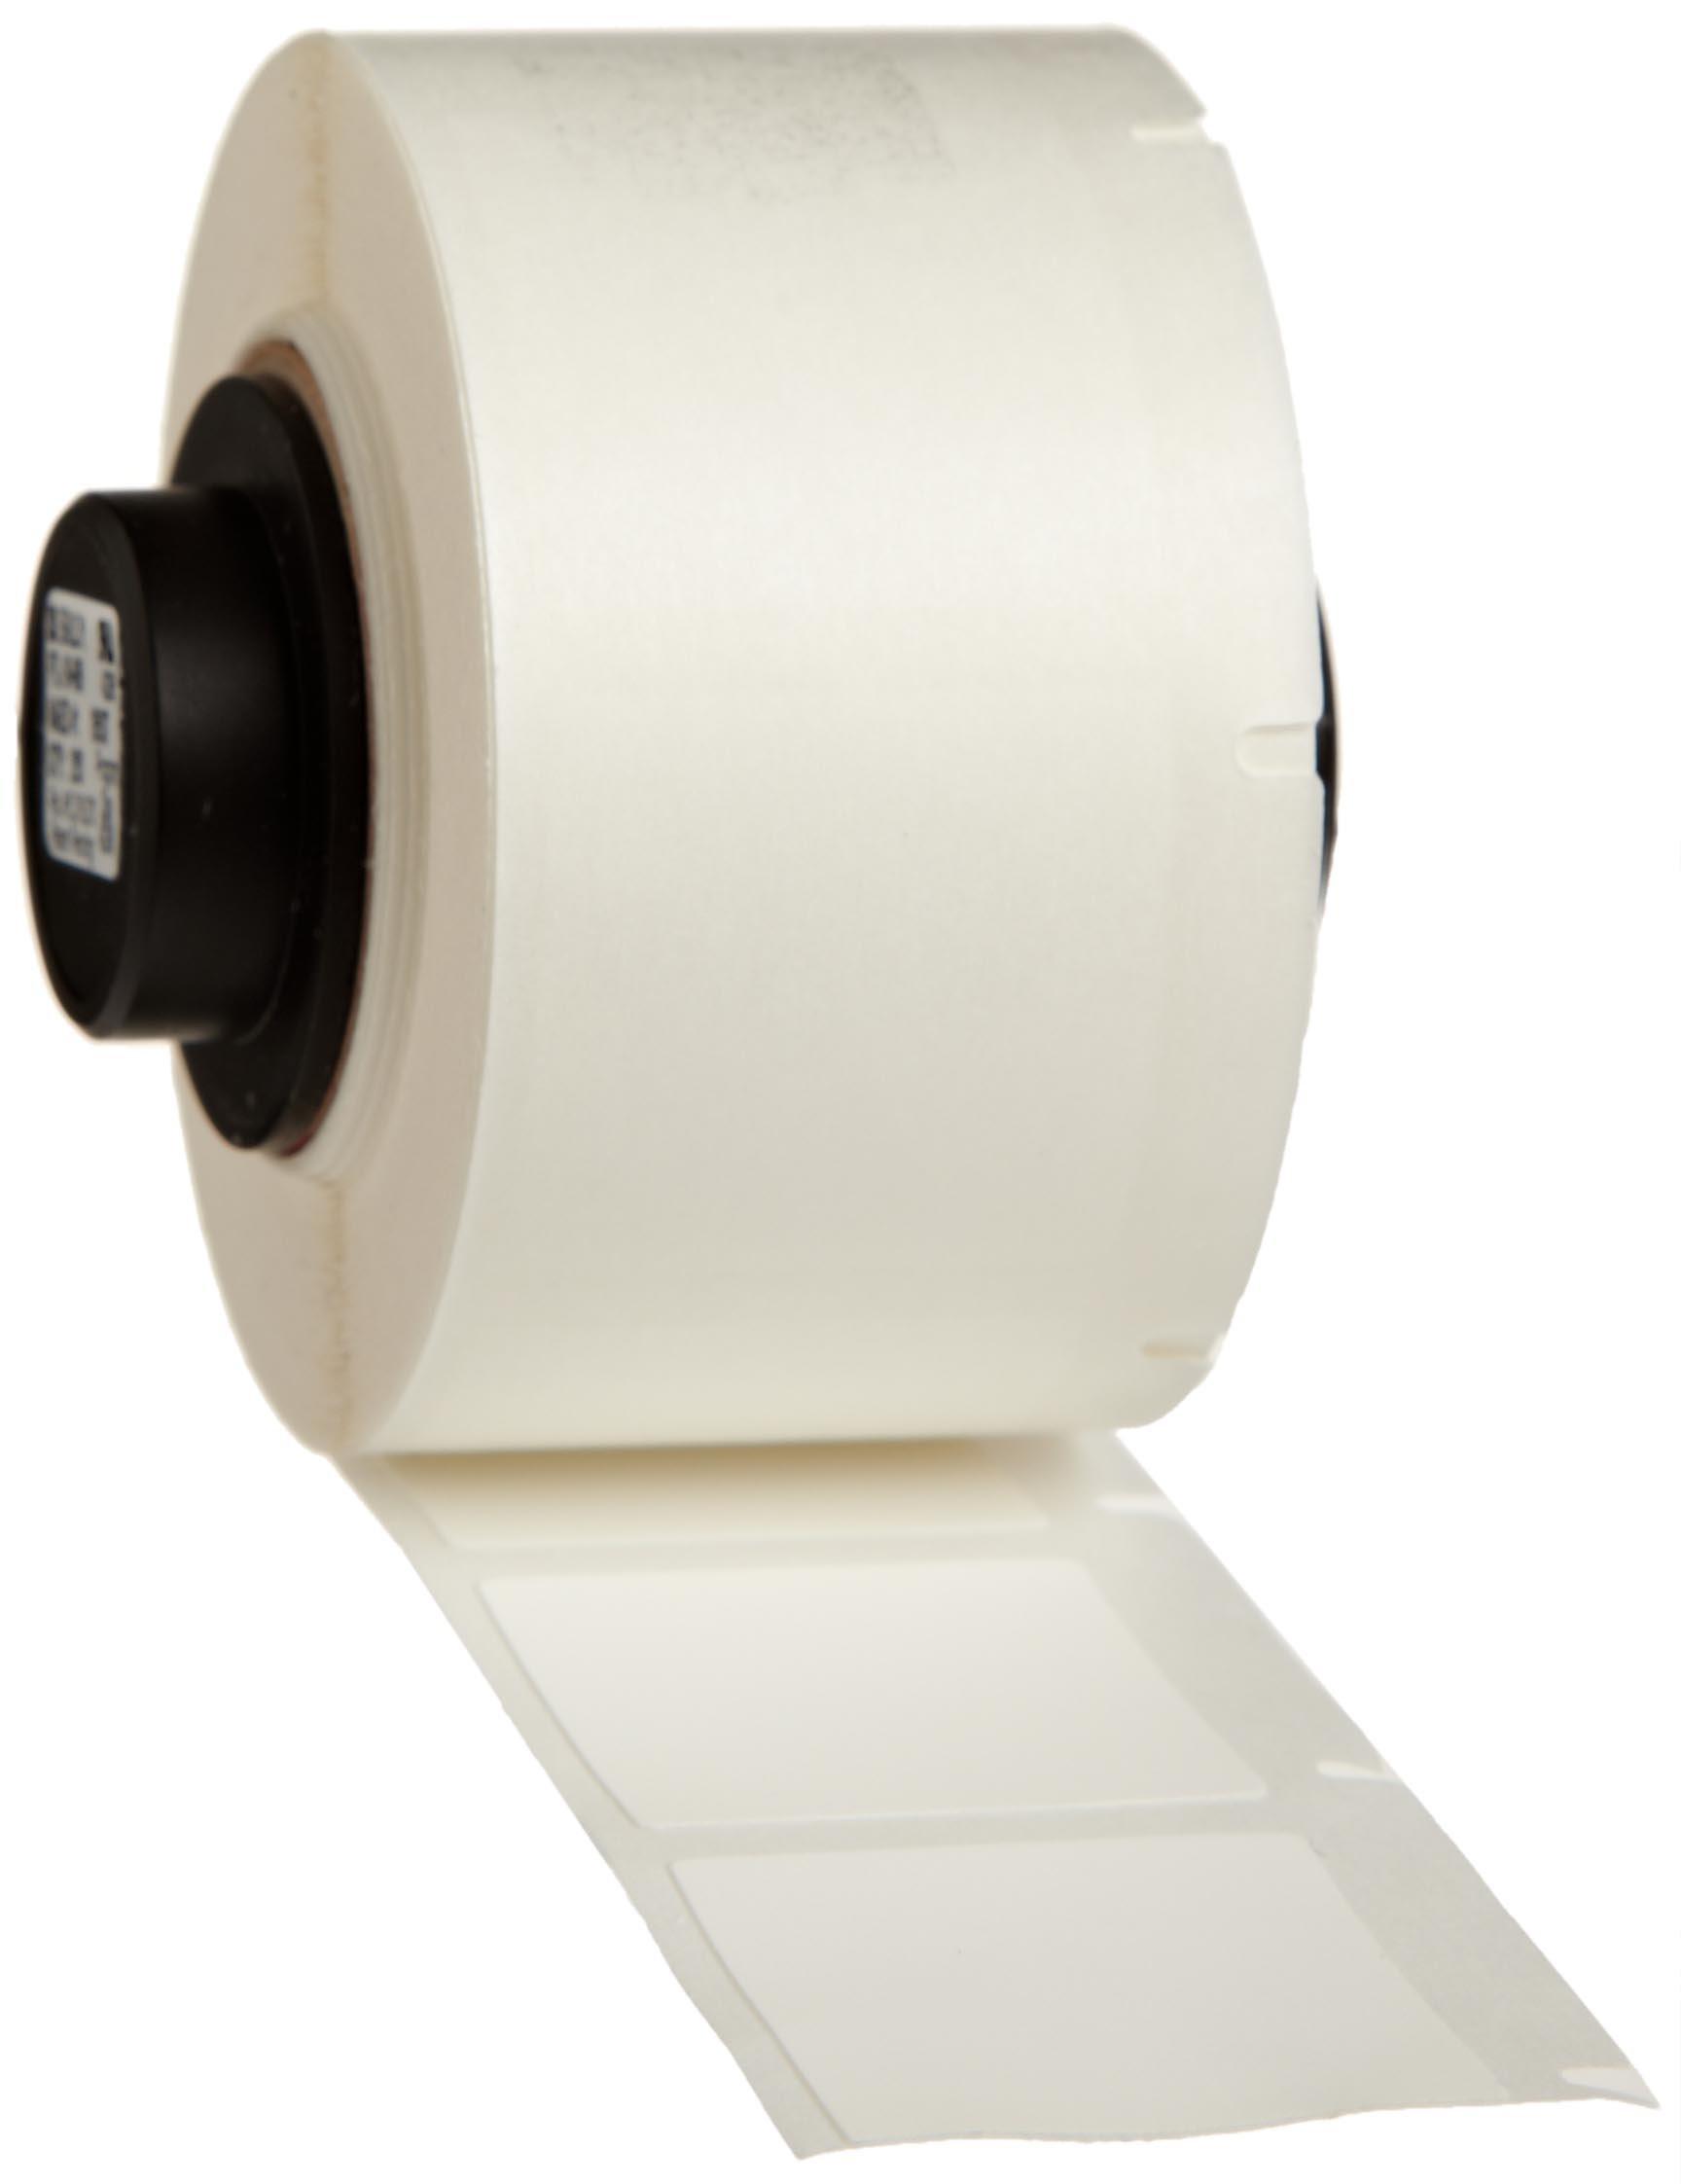 Brady PTL-19-499 TLS 2200 And TLS PC Link 1'' Height, 1'' Width, B-499 Nylon Cloth White Color Label (250 Per Roll)